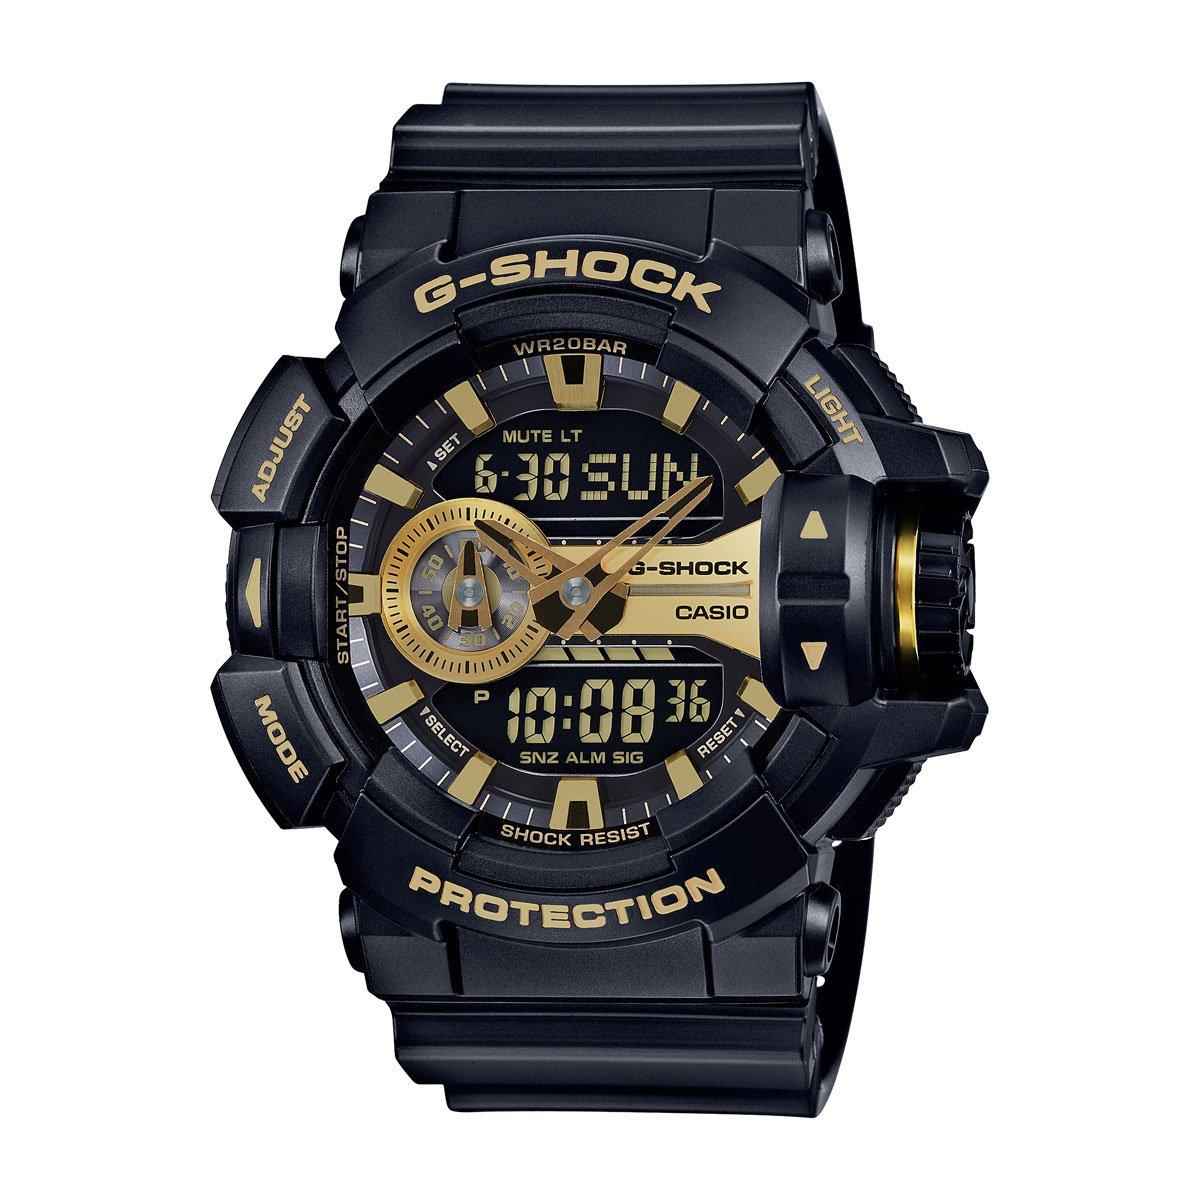 854308c6e1ba Amazon.com  Casio G-Shock GA-400GB Garish Series Watches - Black Gold   One  Size  Watches